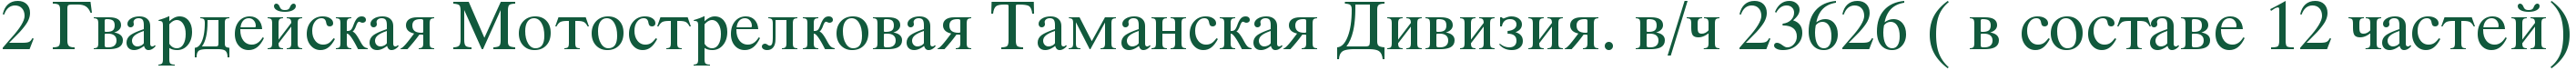 http://x-lines.ru/letters/i/cyrillicbasic/0005/11593C/56/0/geopbr6osmembwcy4n4pbpqoz8eadwf44napdd3y4nqpbxstomem7wcb4gbpdygoszemzwf44n9pbcsosdea6egowmembwfh4napbxqto8emiwfo4g81bwrw4nhpbcsozdemxwfa4g81hegosez7db3yge3ucctsrywnbwf1rdeadwf64gy7dysosdemfwfiryauregto9embwcb4gbpbpqozrwo.png